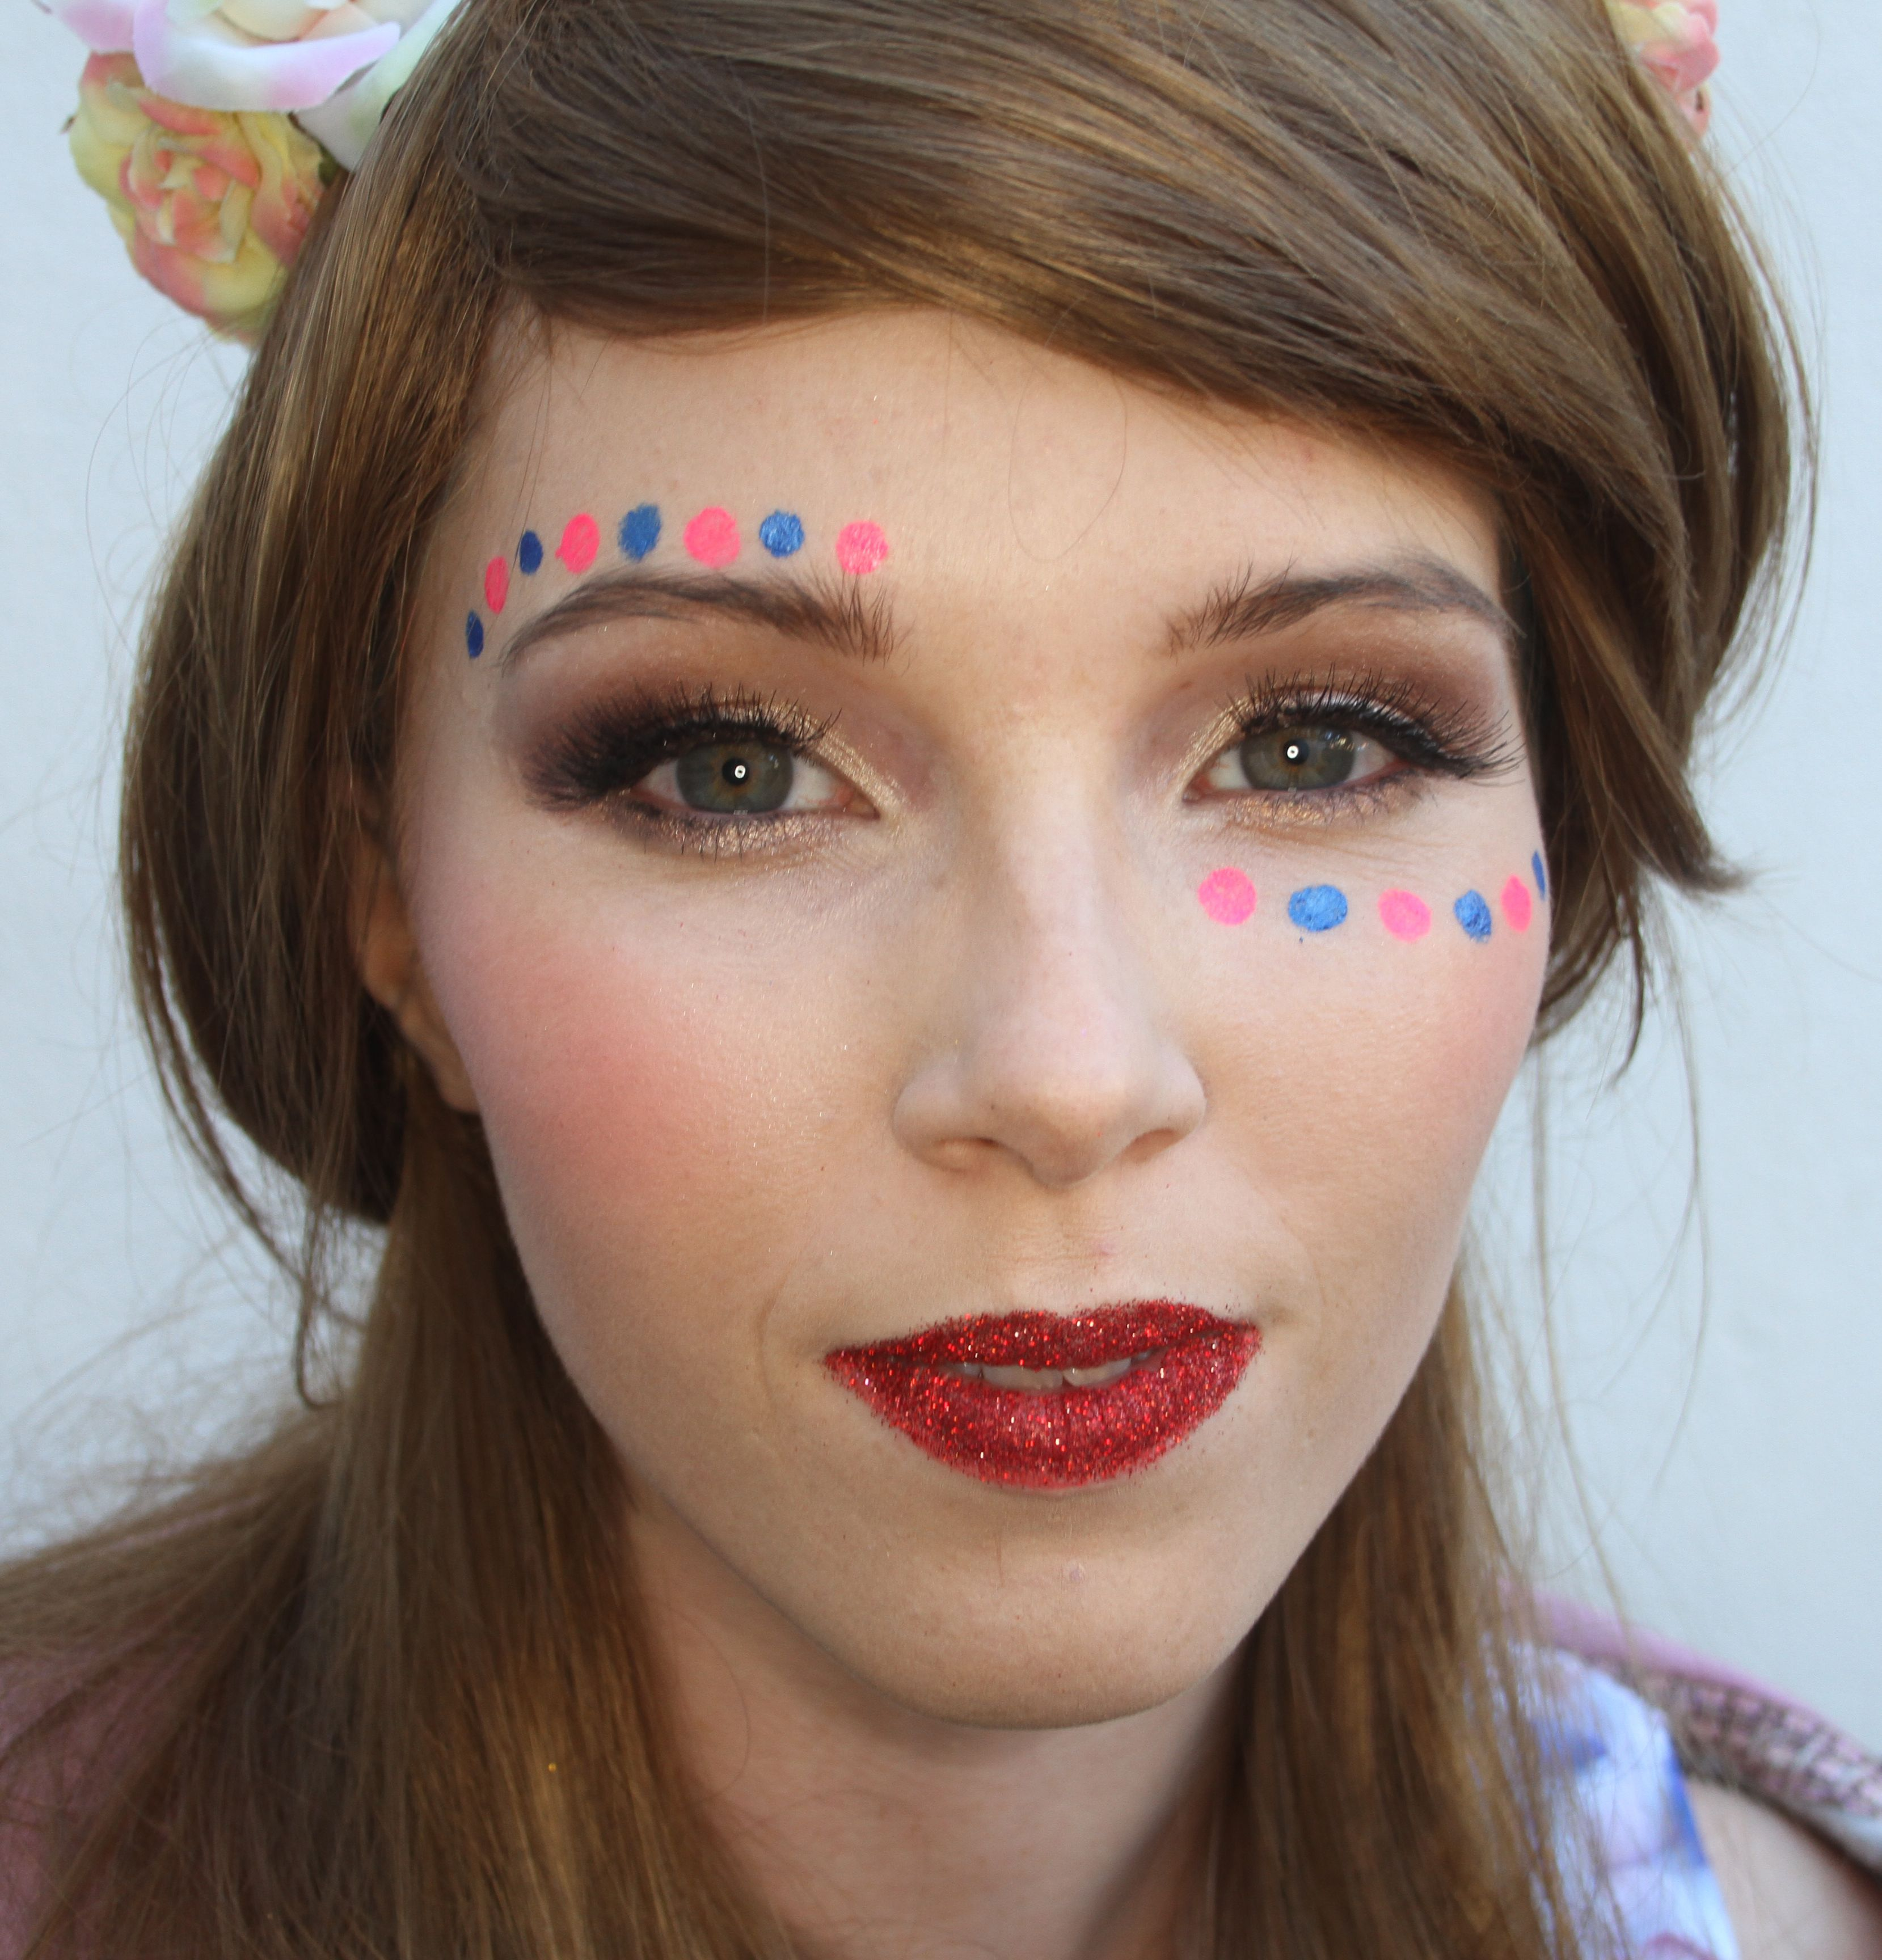 Jax-Glam Beauty Face Art Small Dots   Face Painting & body ...